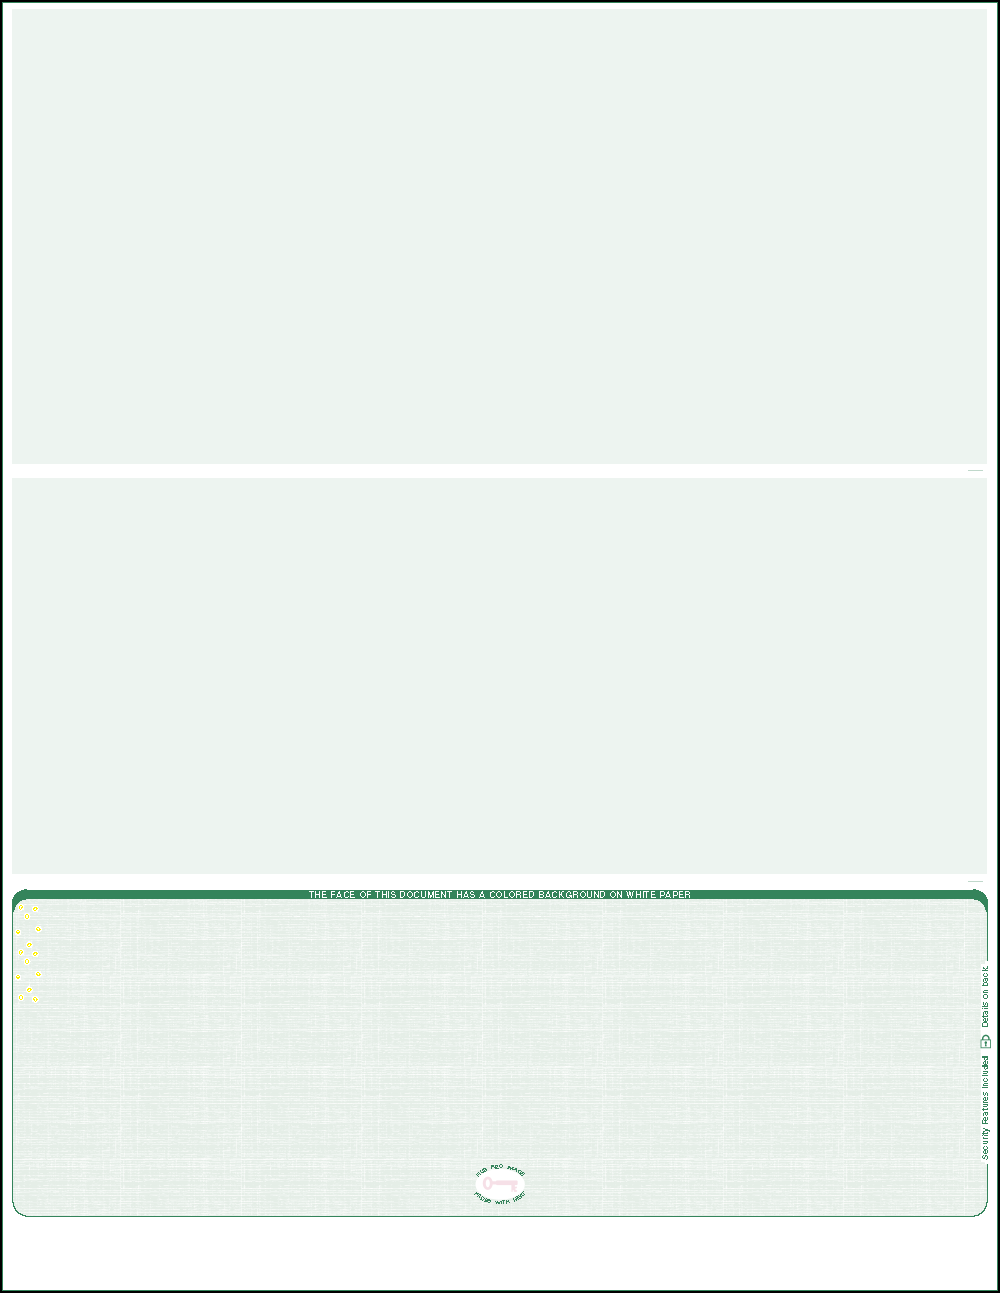 Green Linen Bottom Position Blank Laser Check